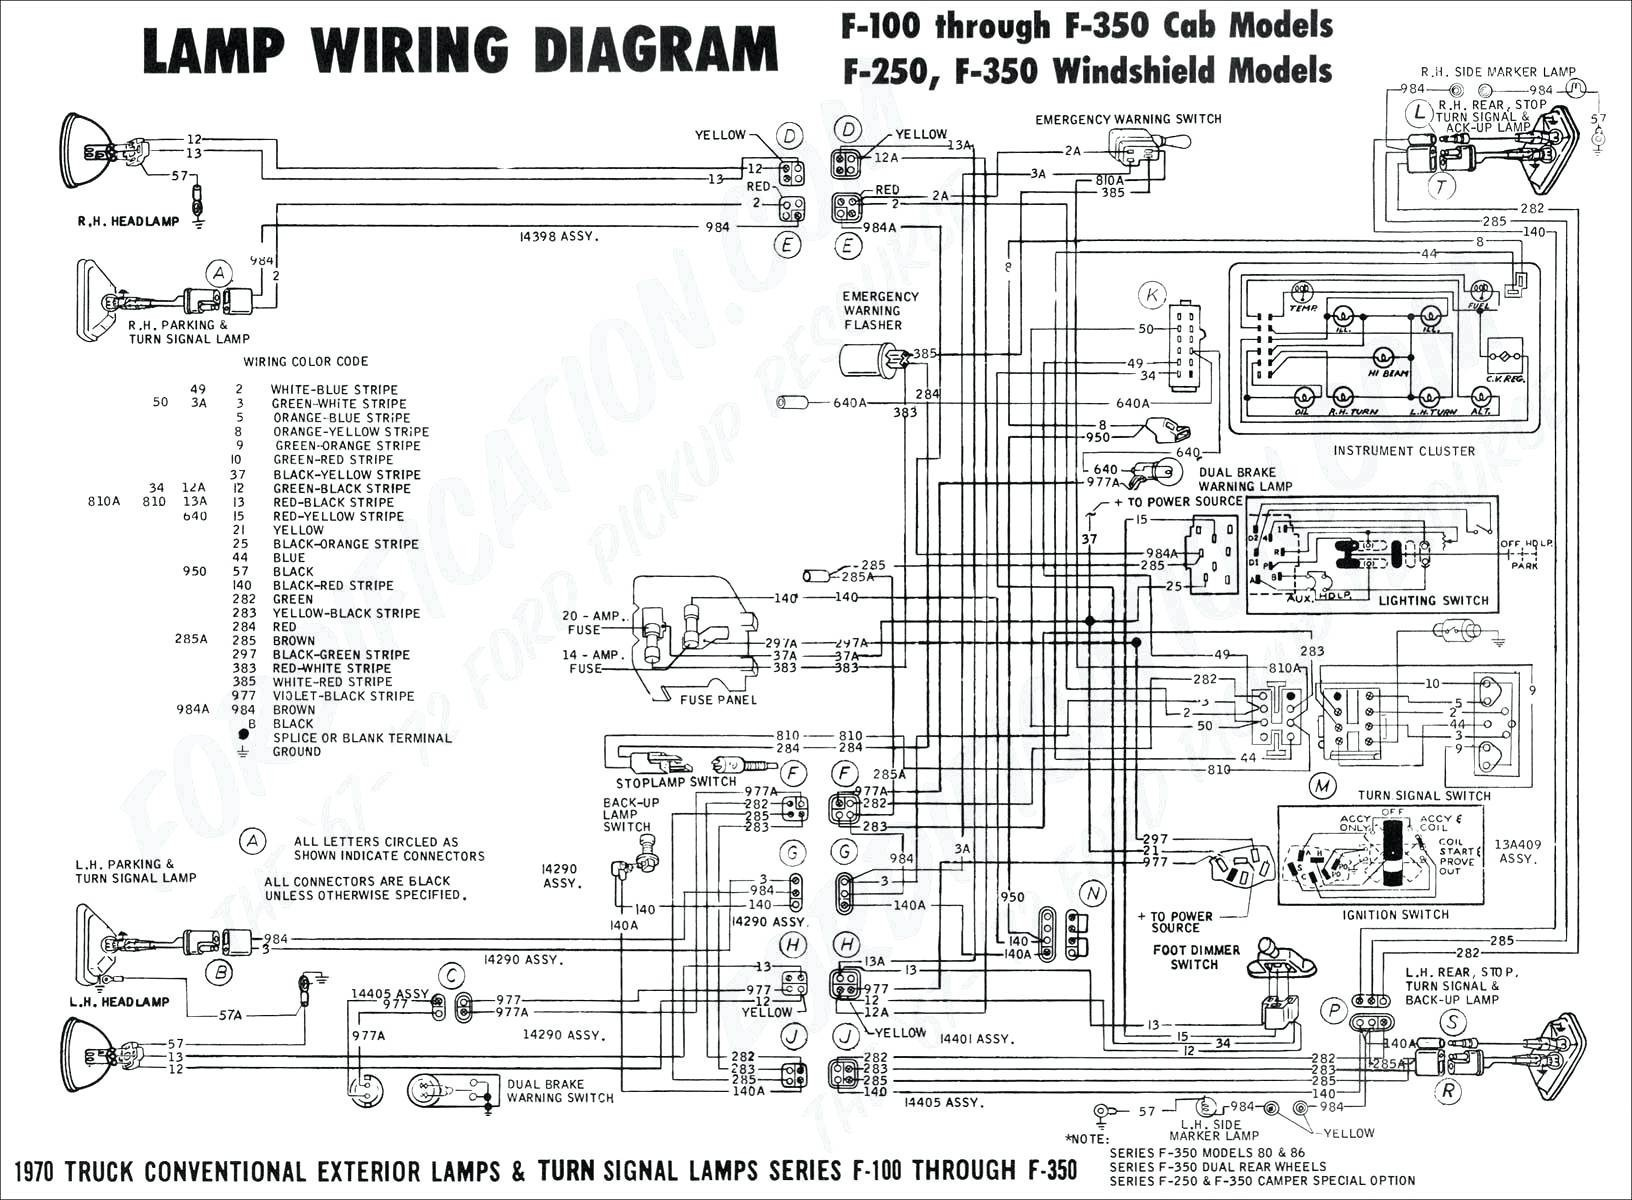 1994 Buick Century Fuse Box Diagram 1999 Buick Regal Fuse Box Diagram